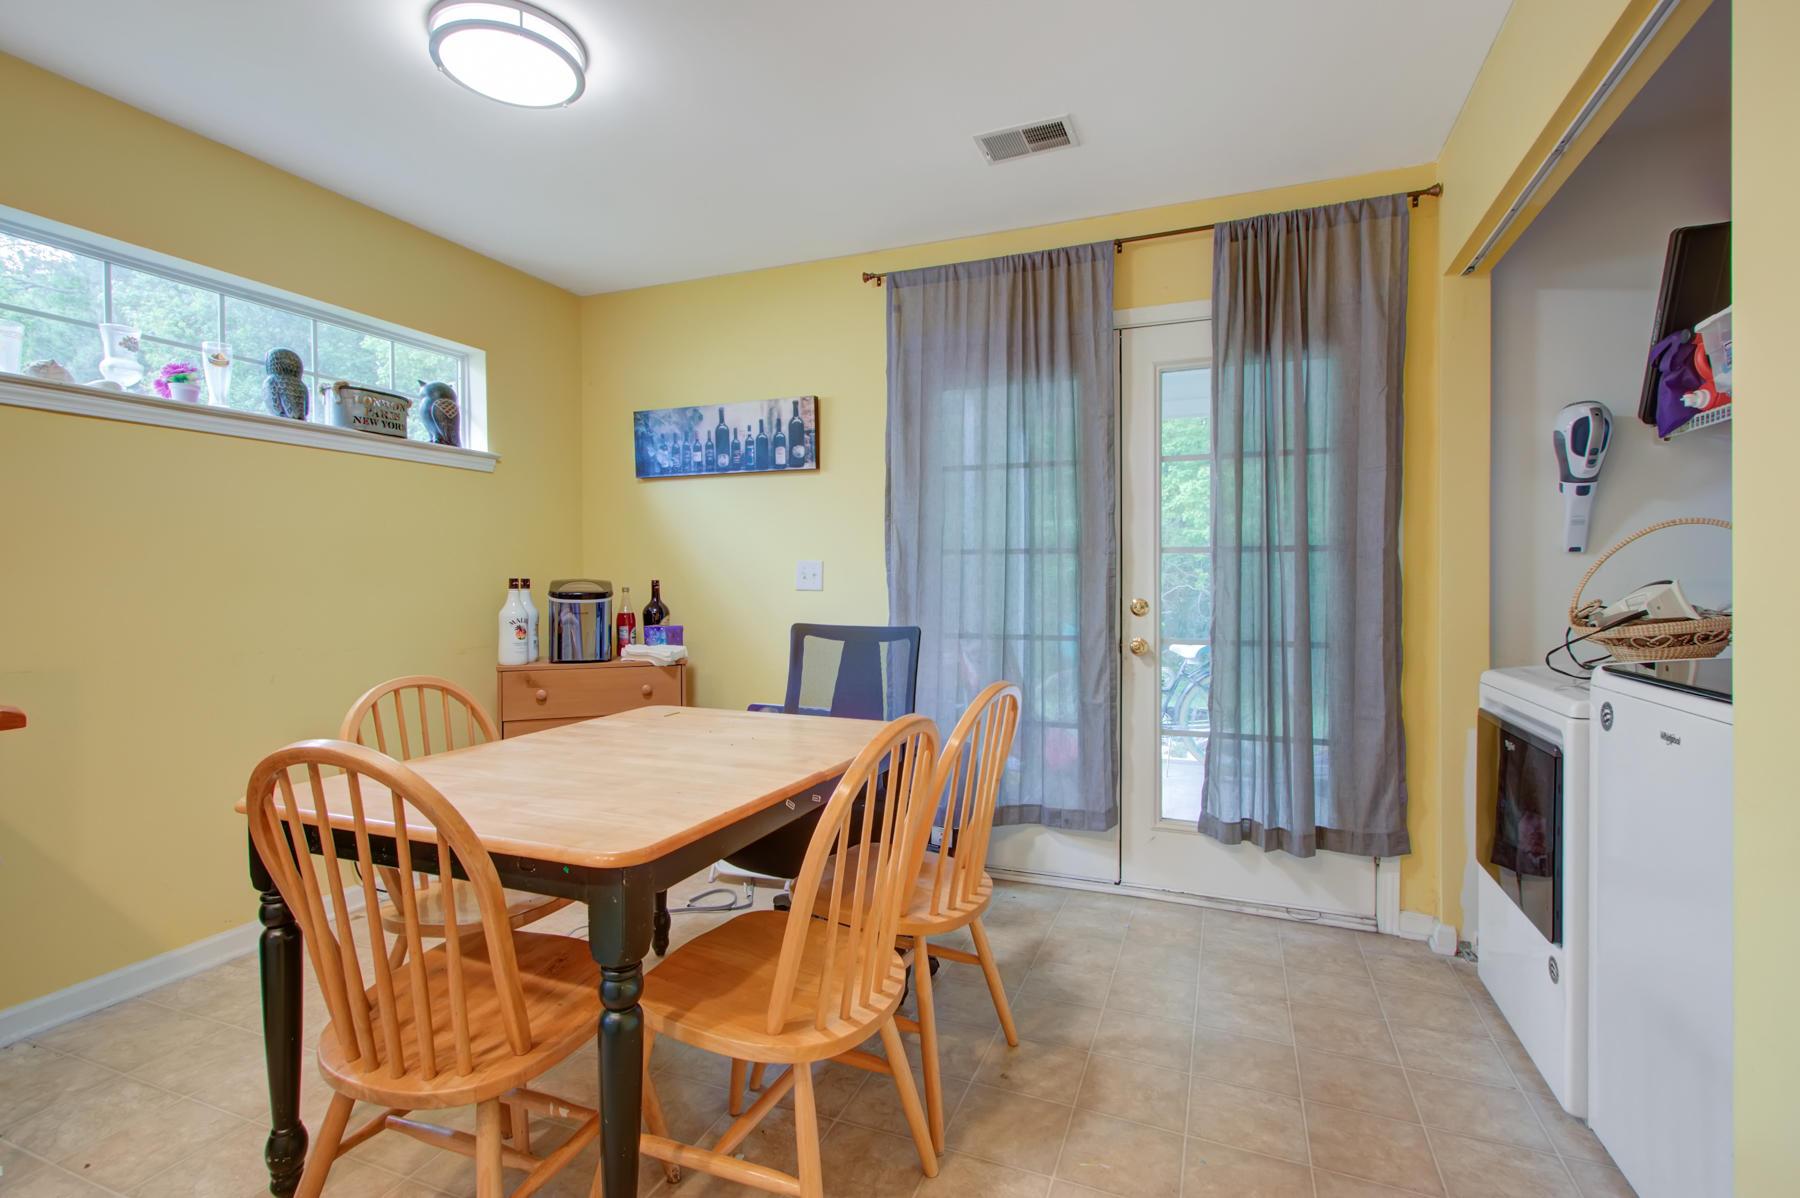 Dunes West Homes For Sale - 2232 Kings Gate, Mount Pleasant, SC - 28